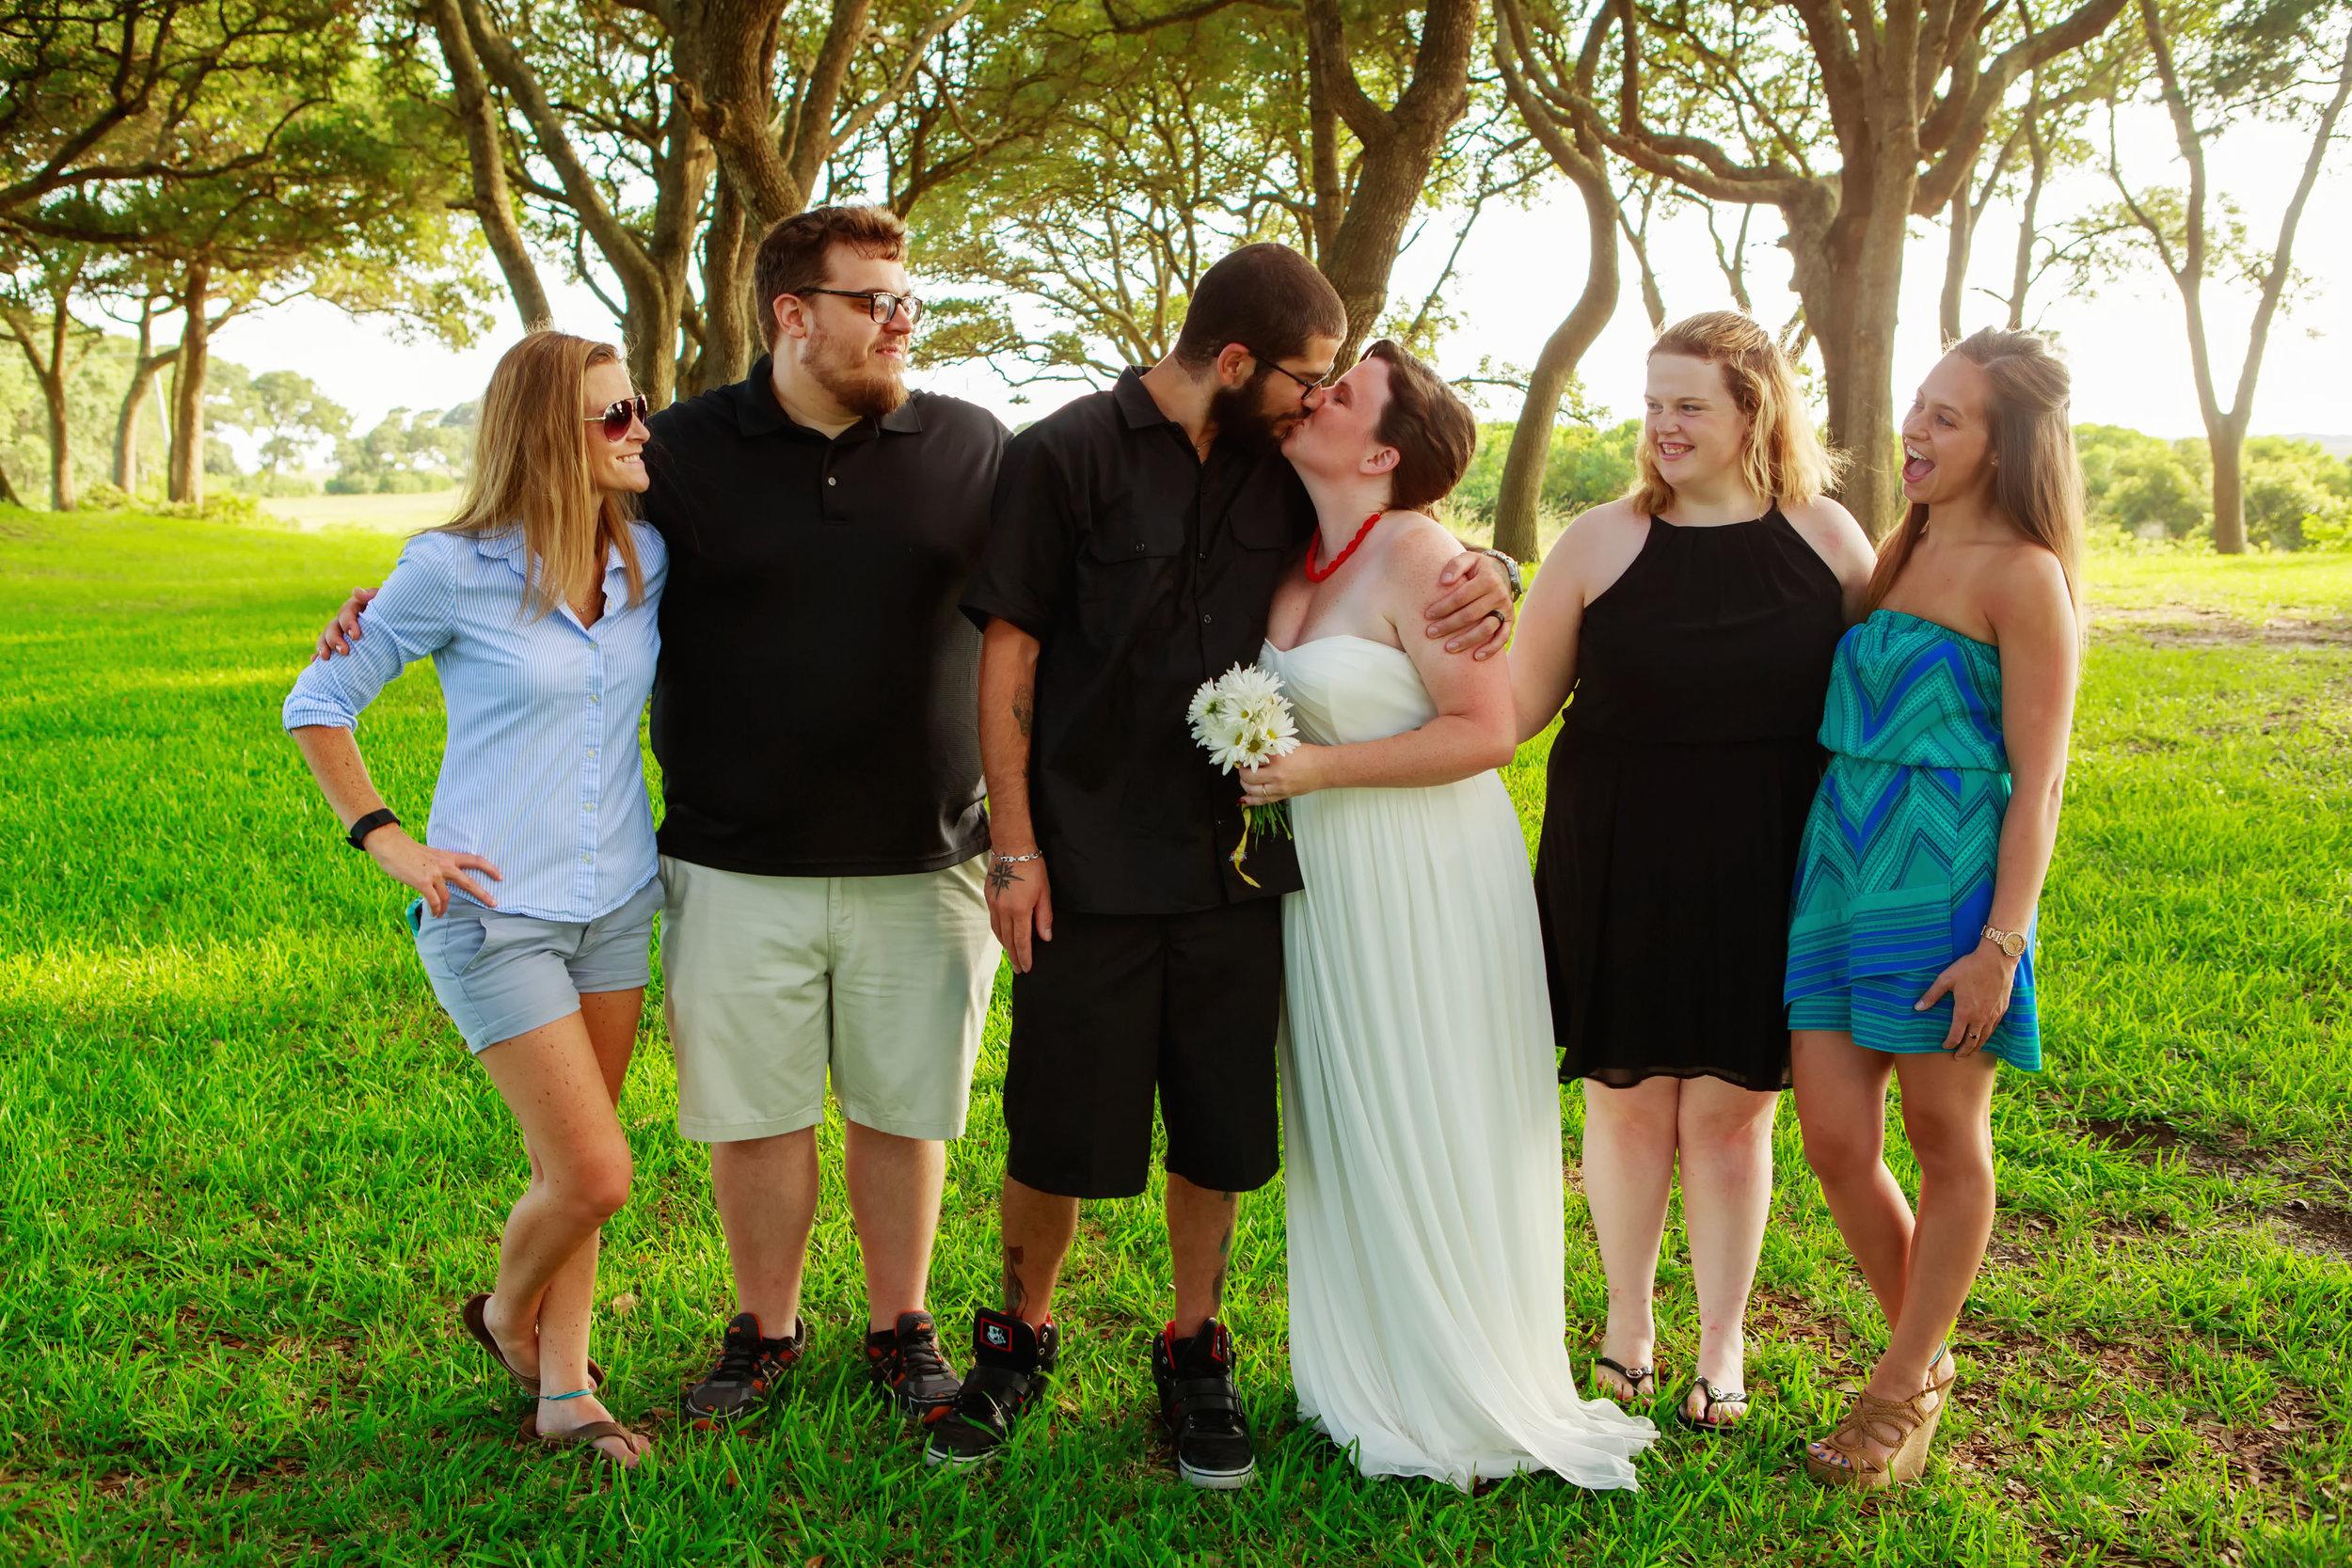 Fort_Fisher_Wedding_Photographer_Tiffany_Abruzzo_43.jpg